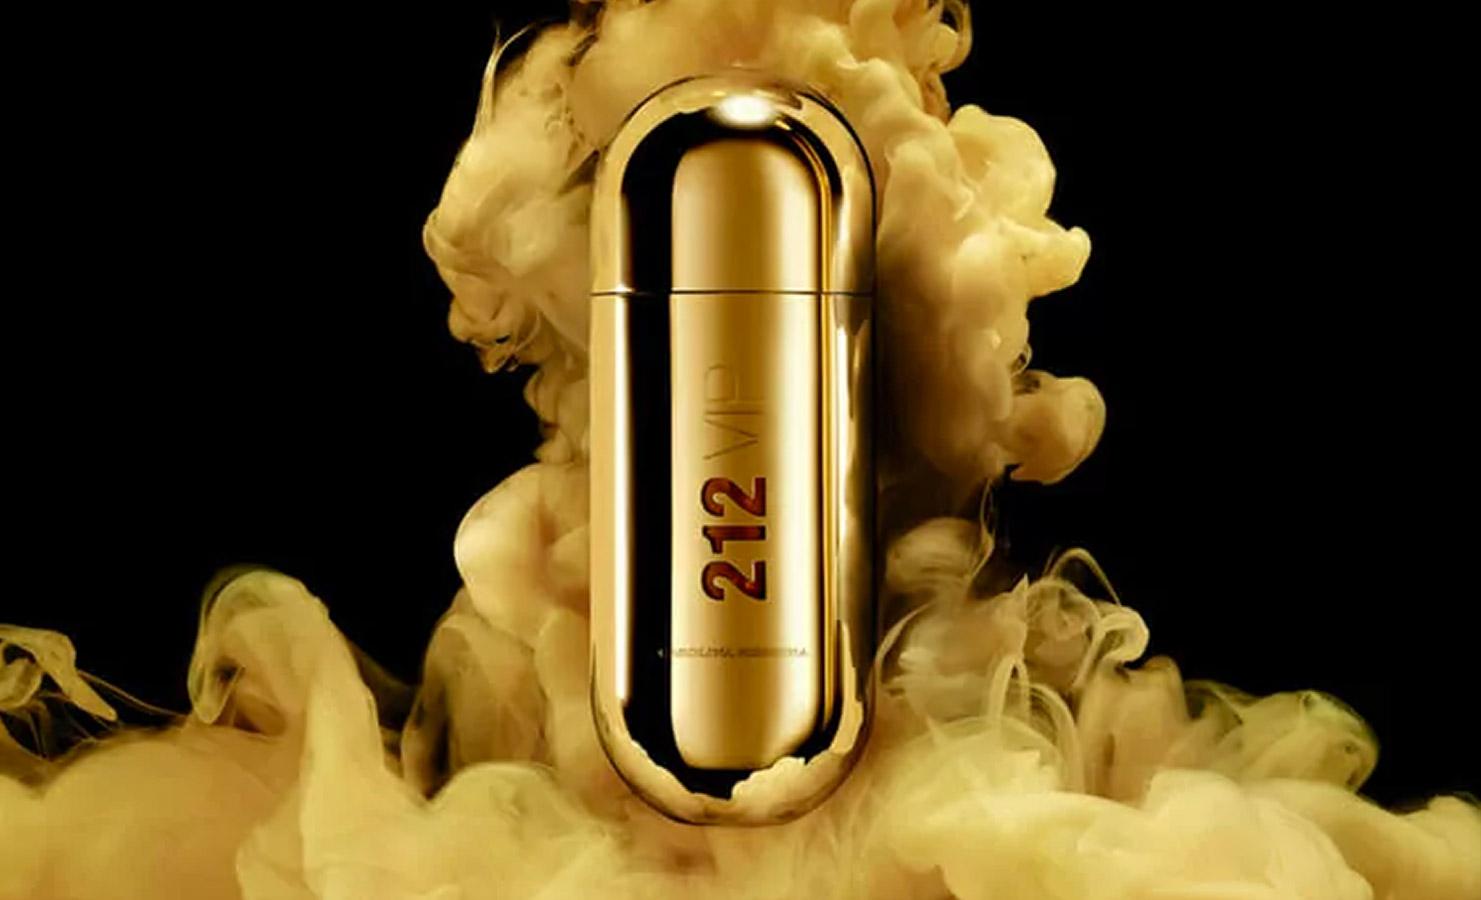 عطر ۲۱۲ vip گلد